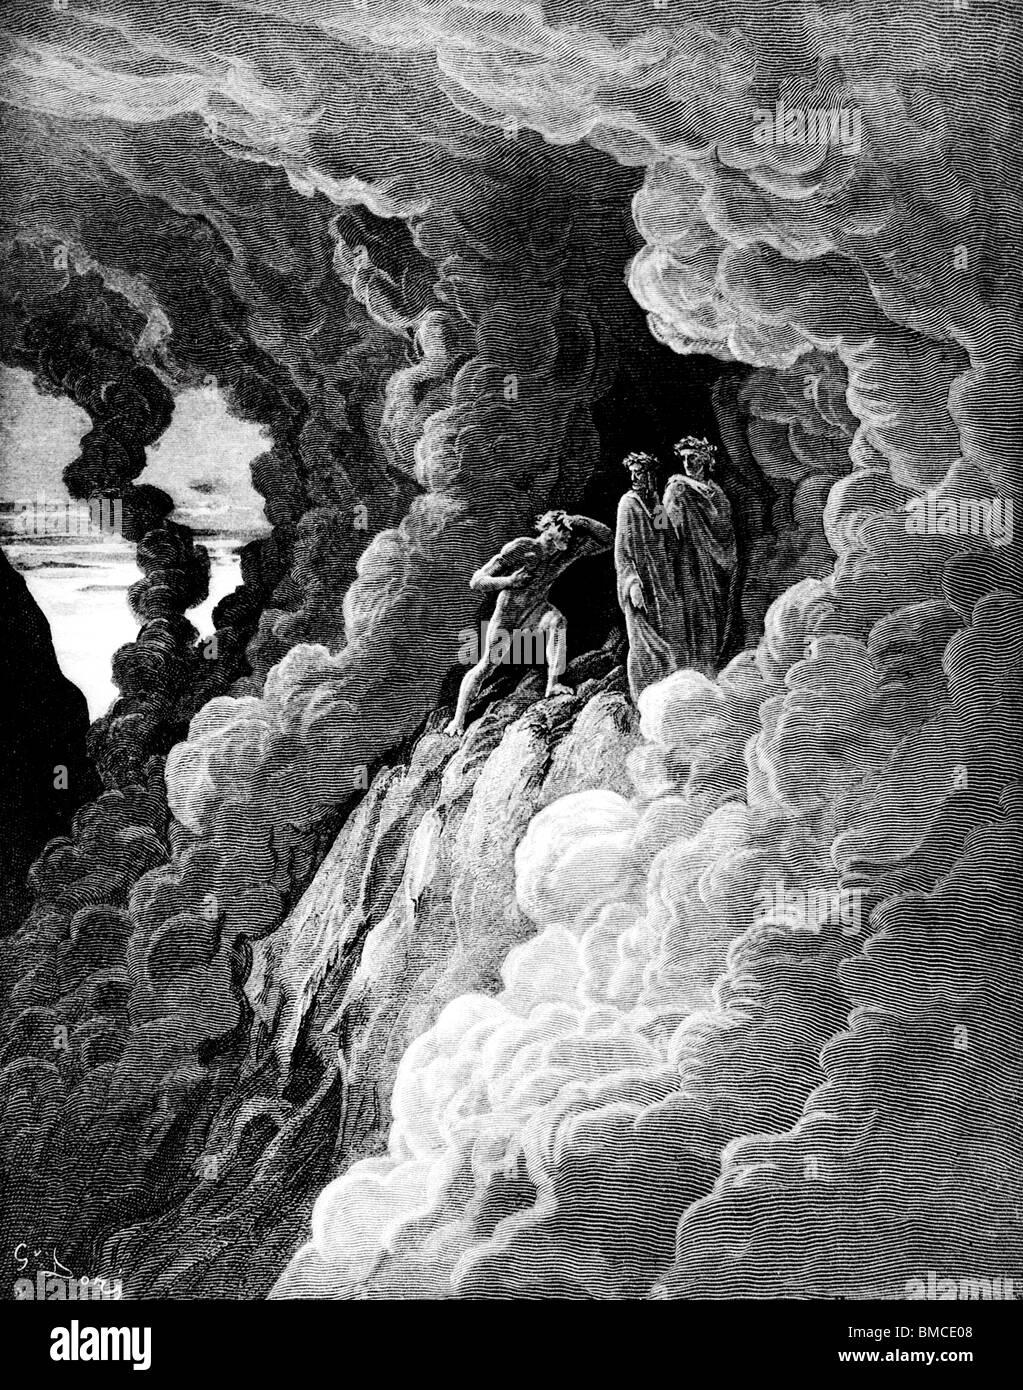 The wrathful in smoke 2 Stock Photo